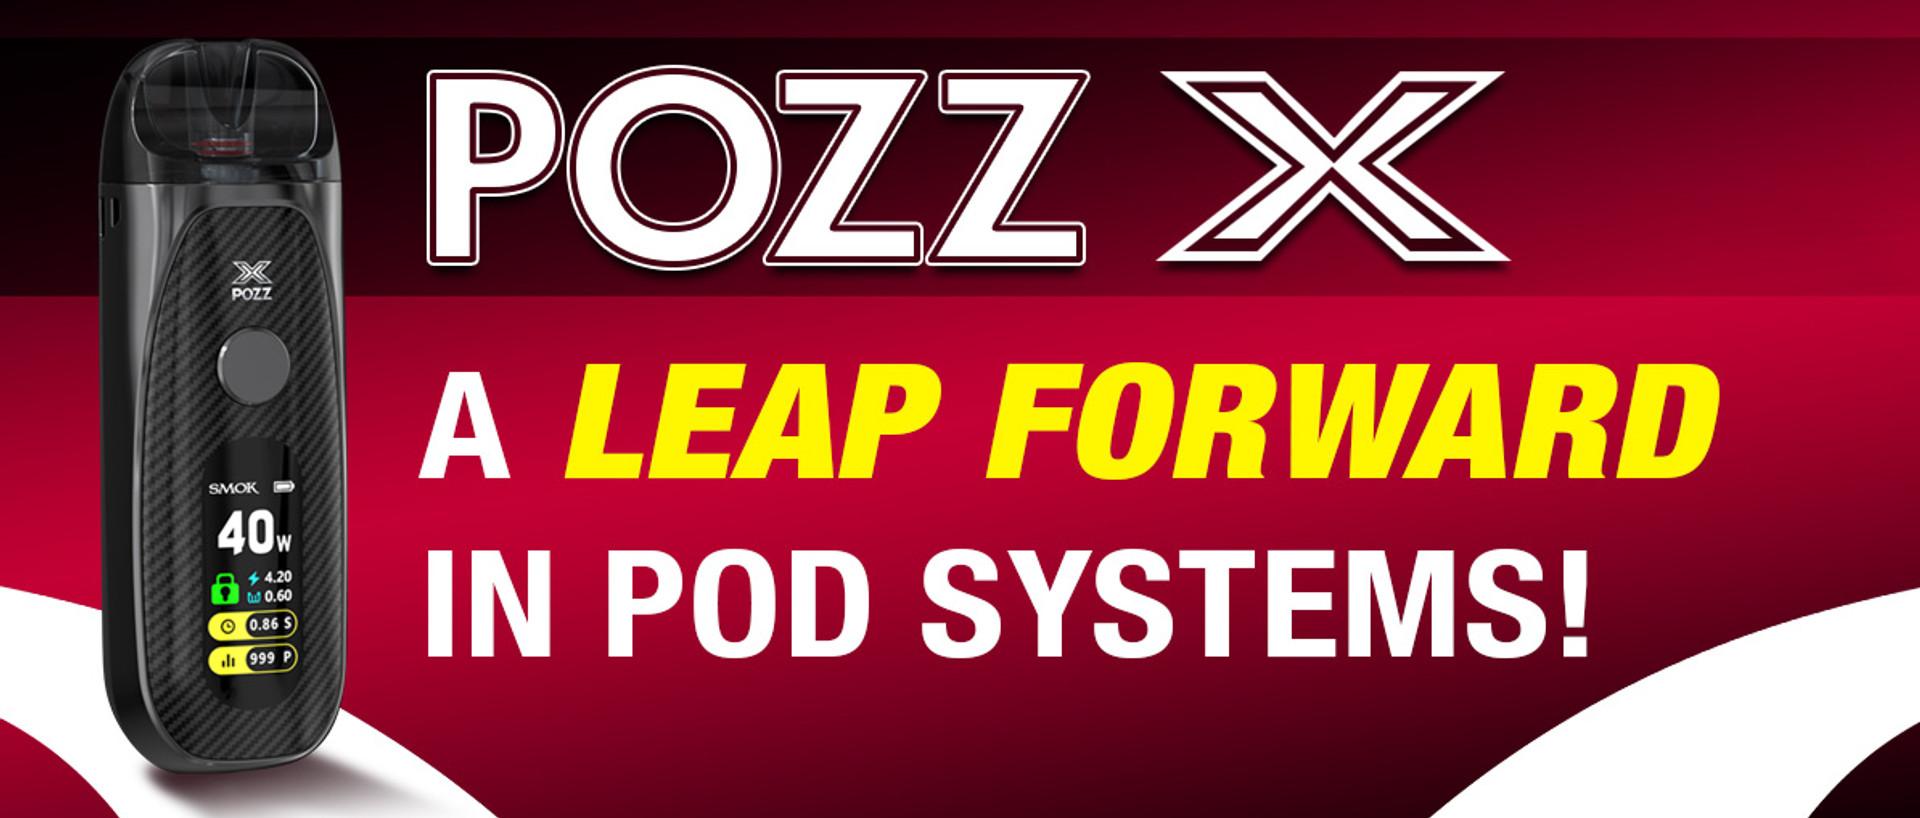 Pozz X Starter Kit